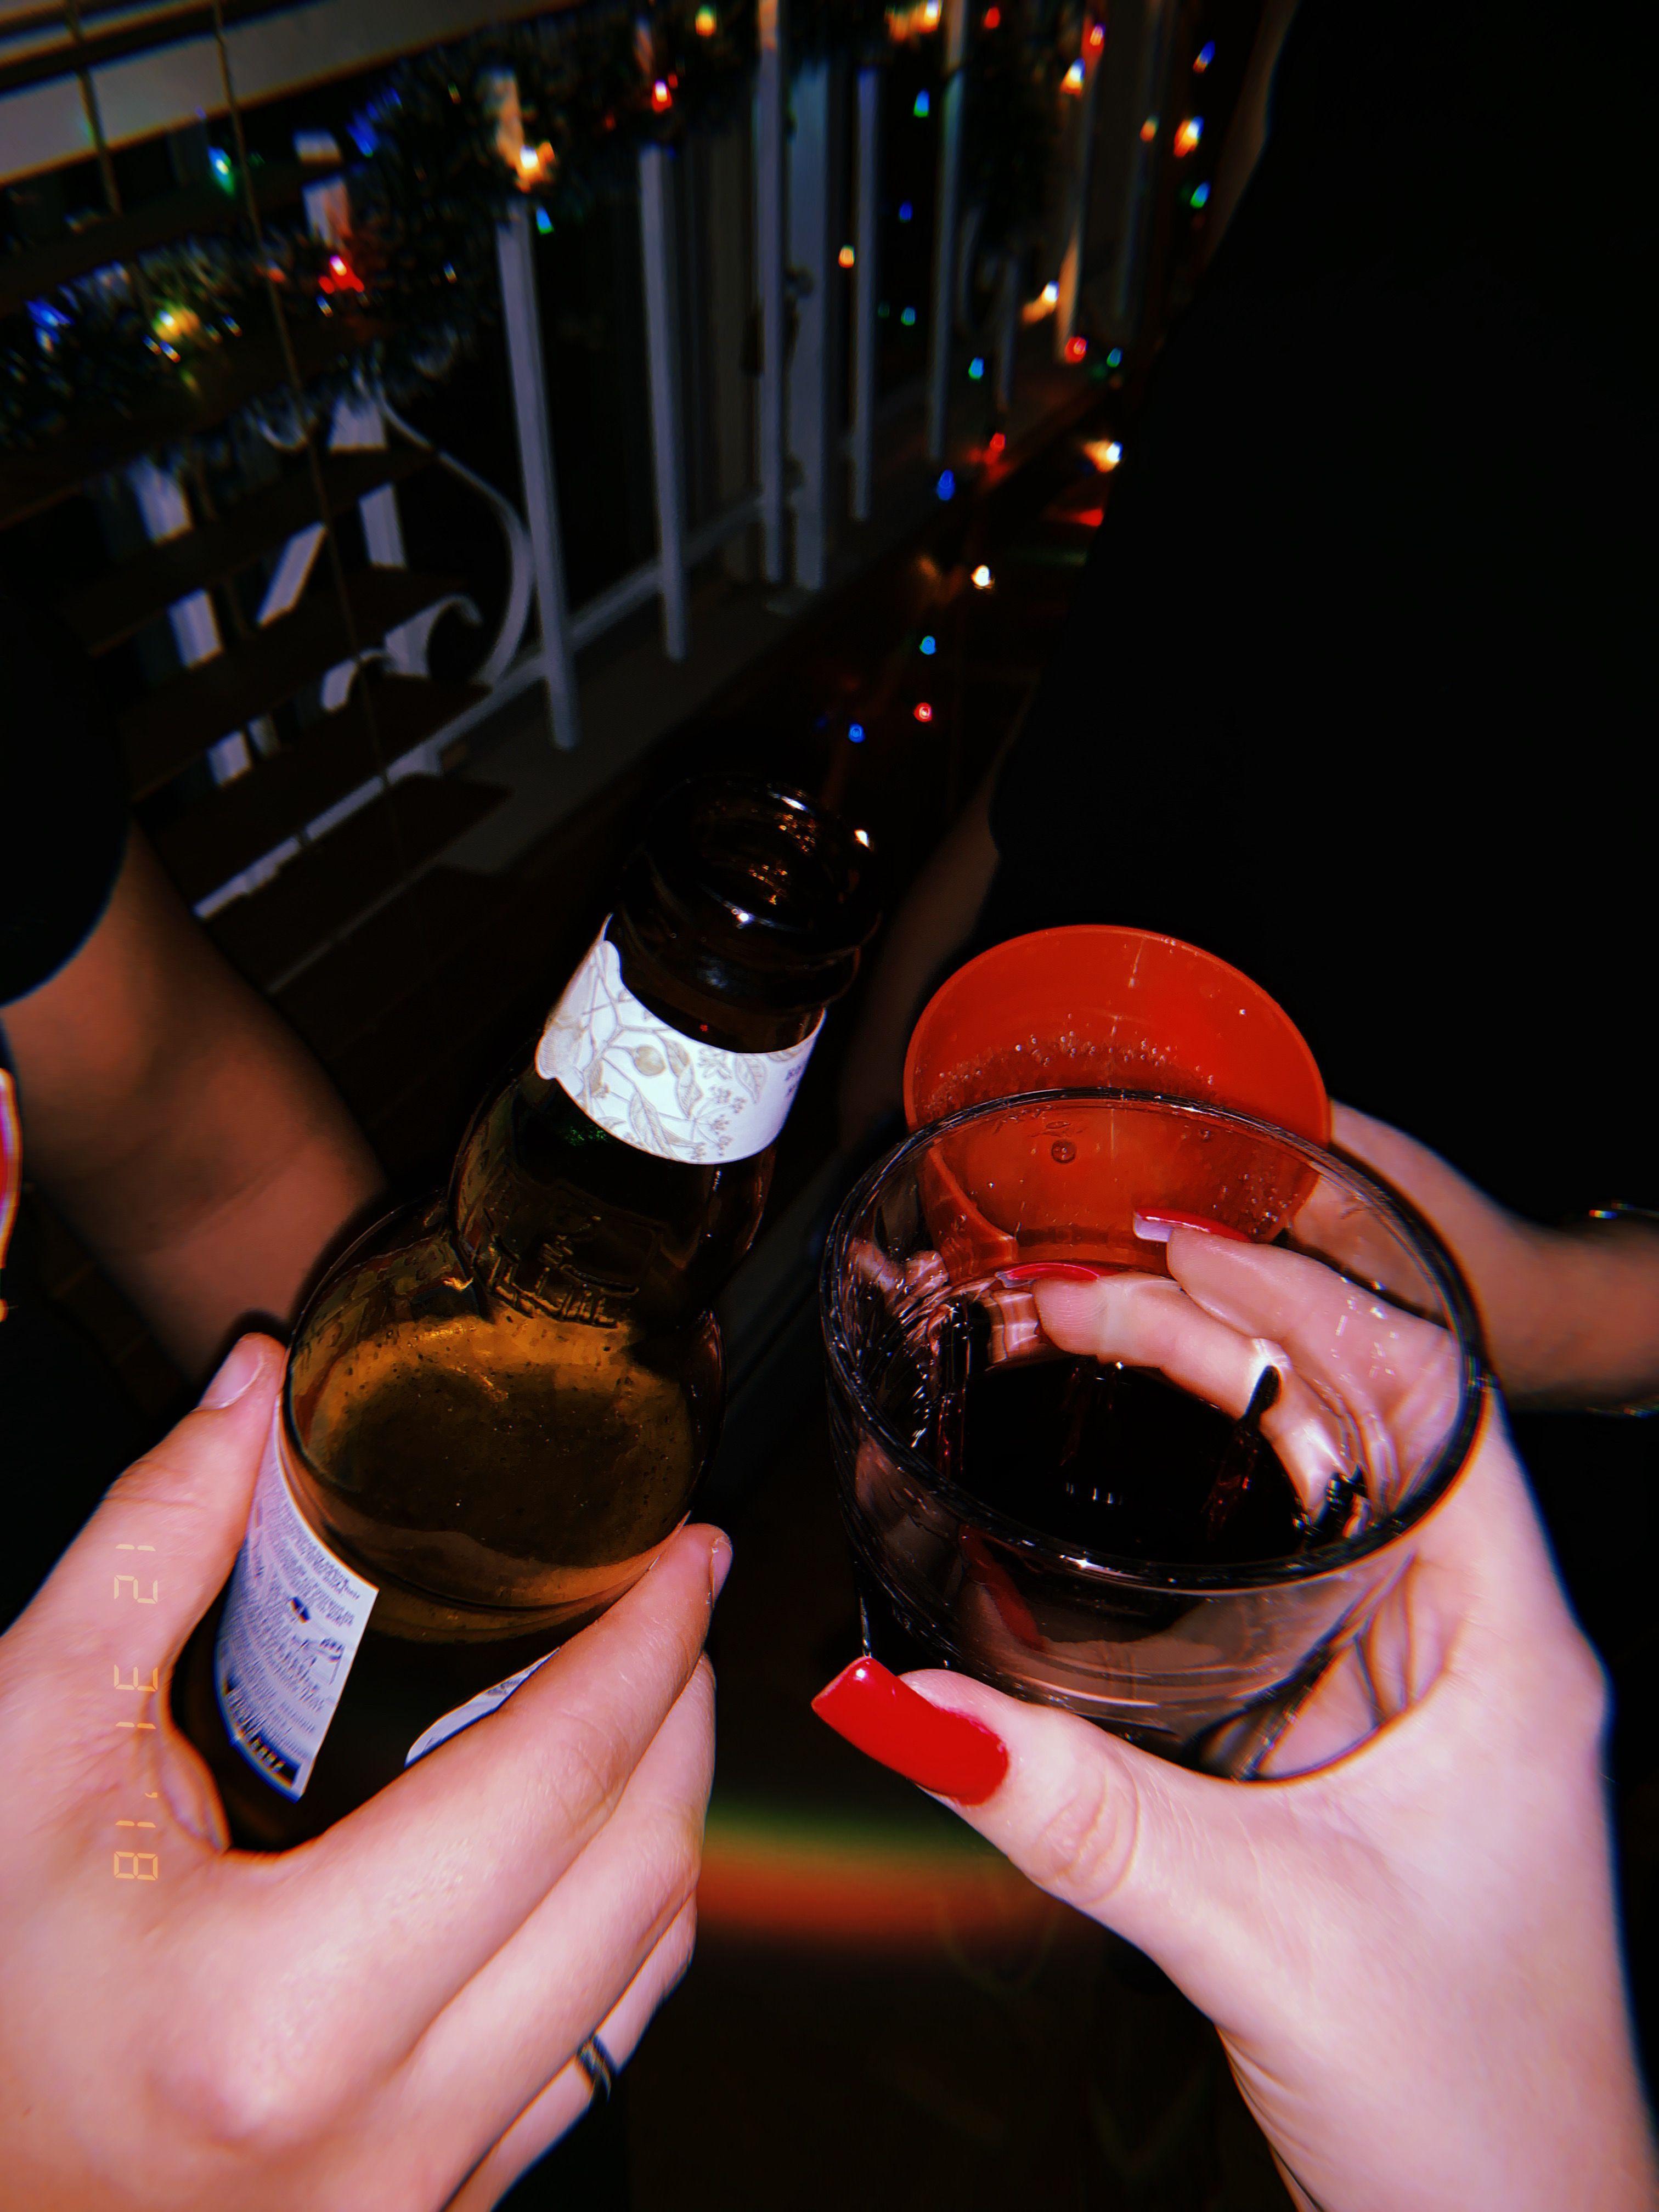 Pin By Sahar Tohidiniya On O T H E R Alcohol Alcoholic Drinks Red Wine